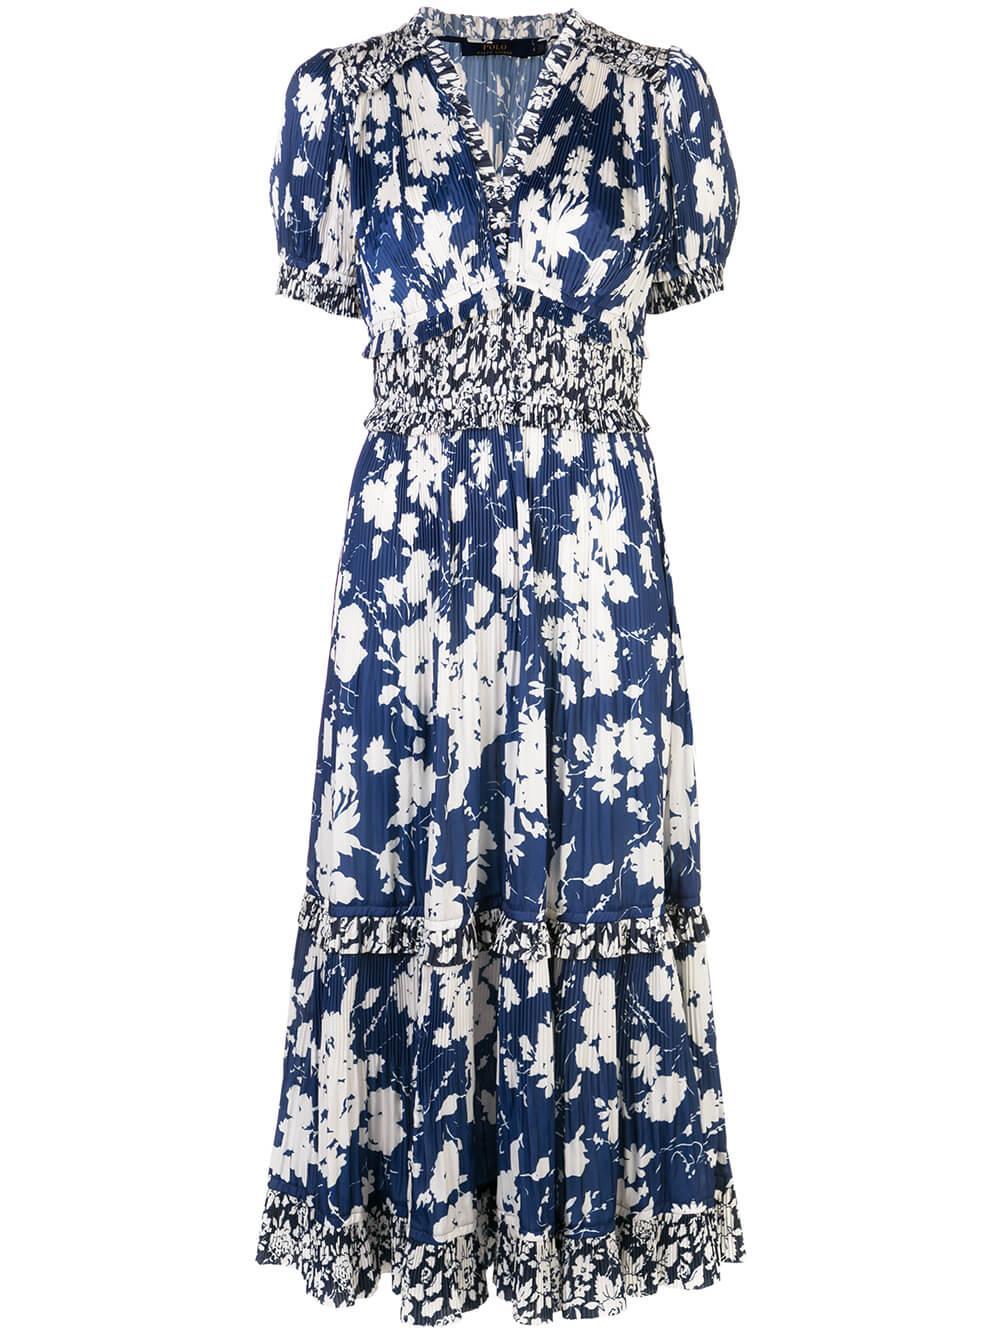 S/S Floral Printed Vintage Satin Dress Item # 211788537001